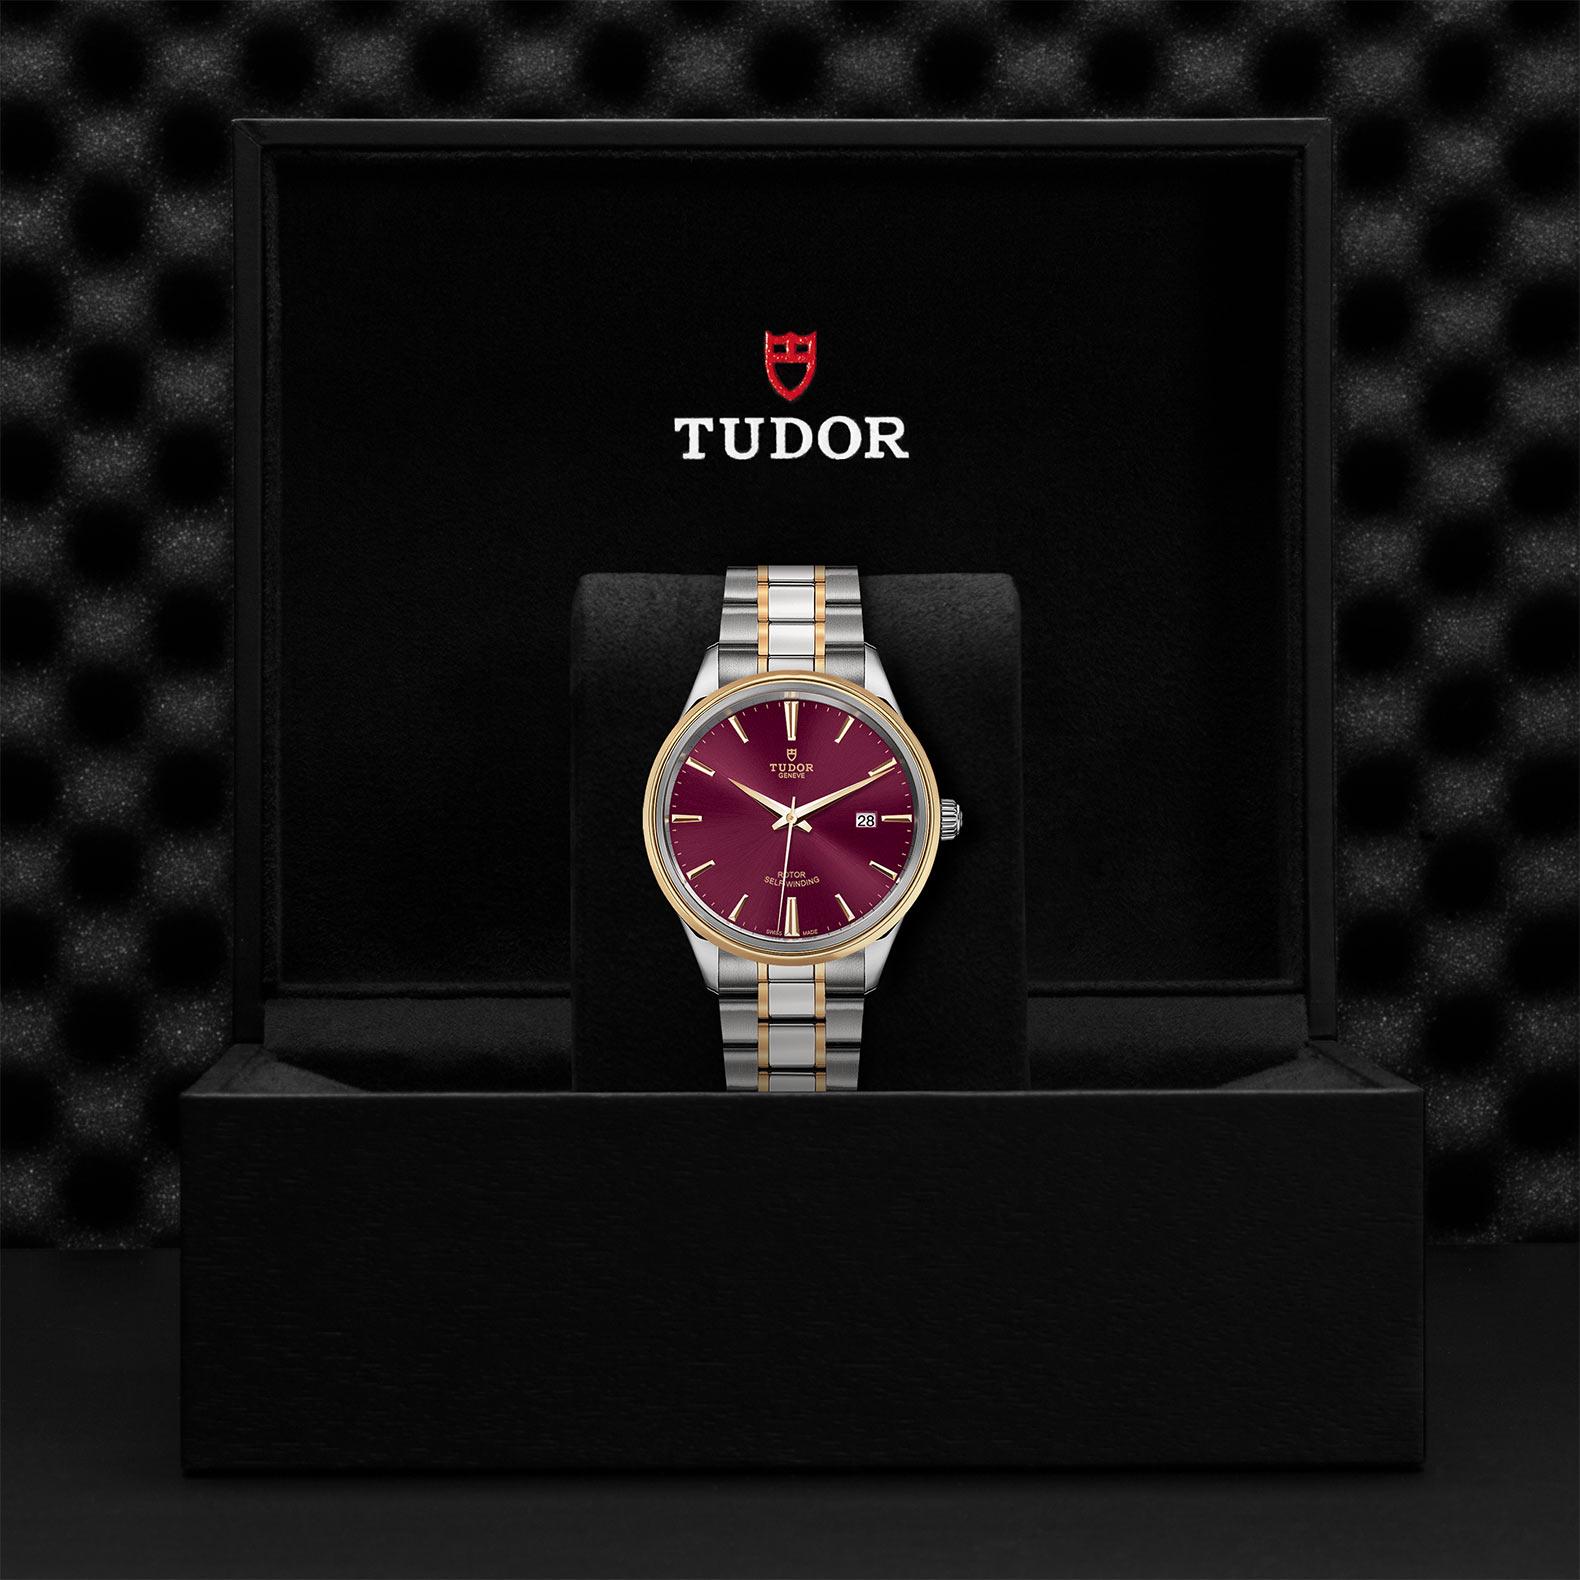 TUDOR Style M12703 0013 Presentationbox